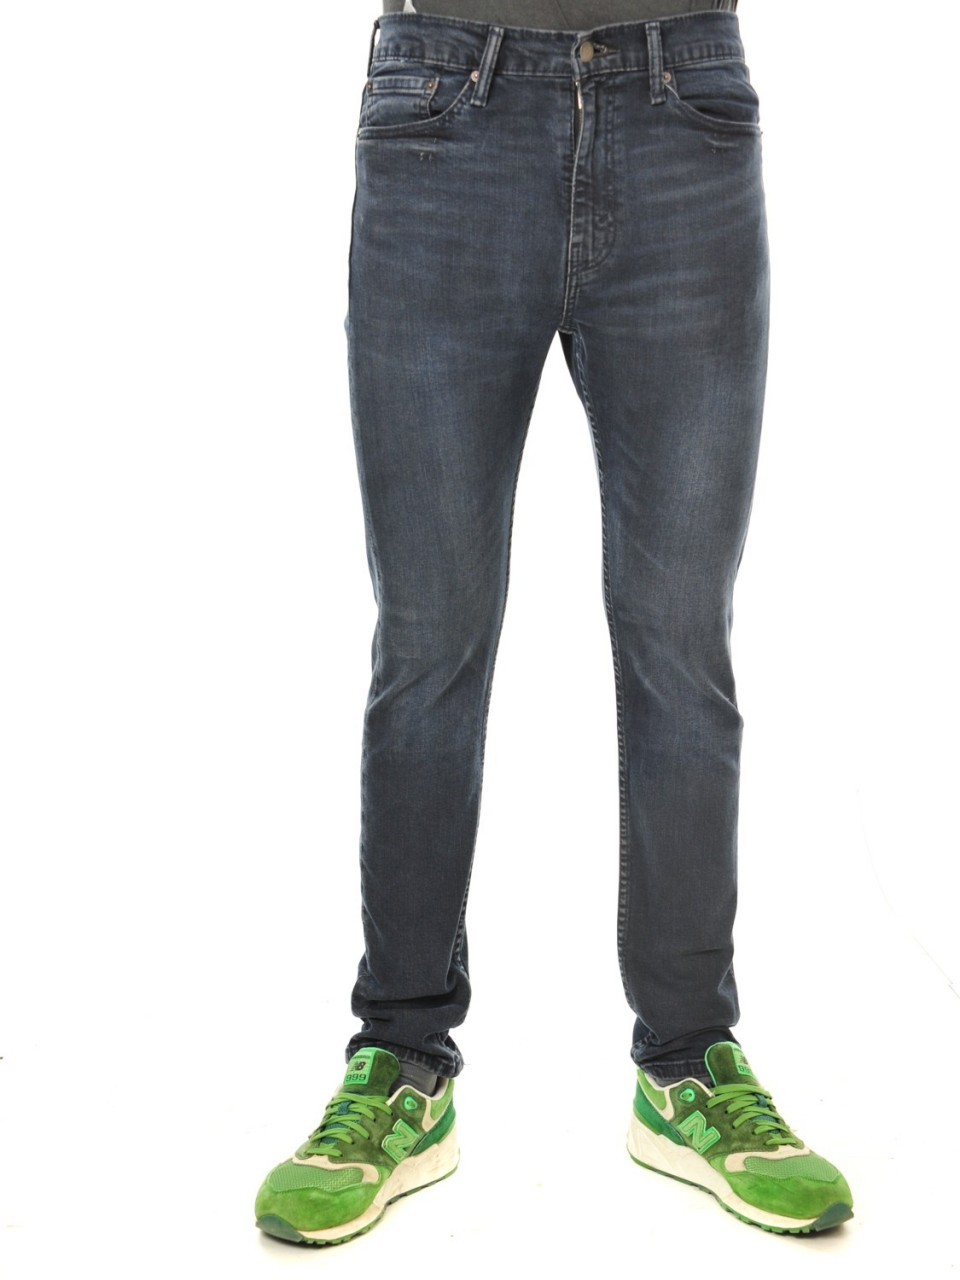 Levi's Uomo Jeans Levi's 510 Uomo Shypard 5100658E